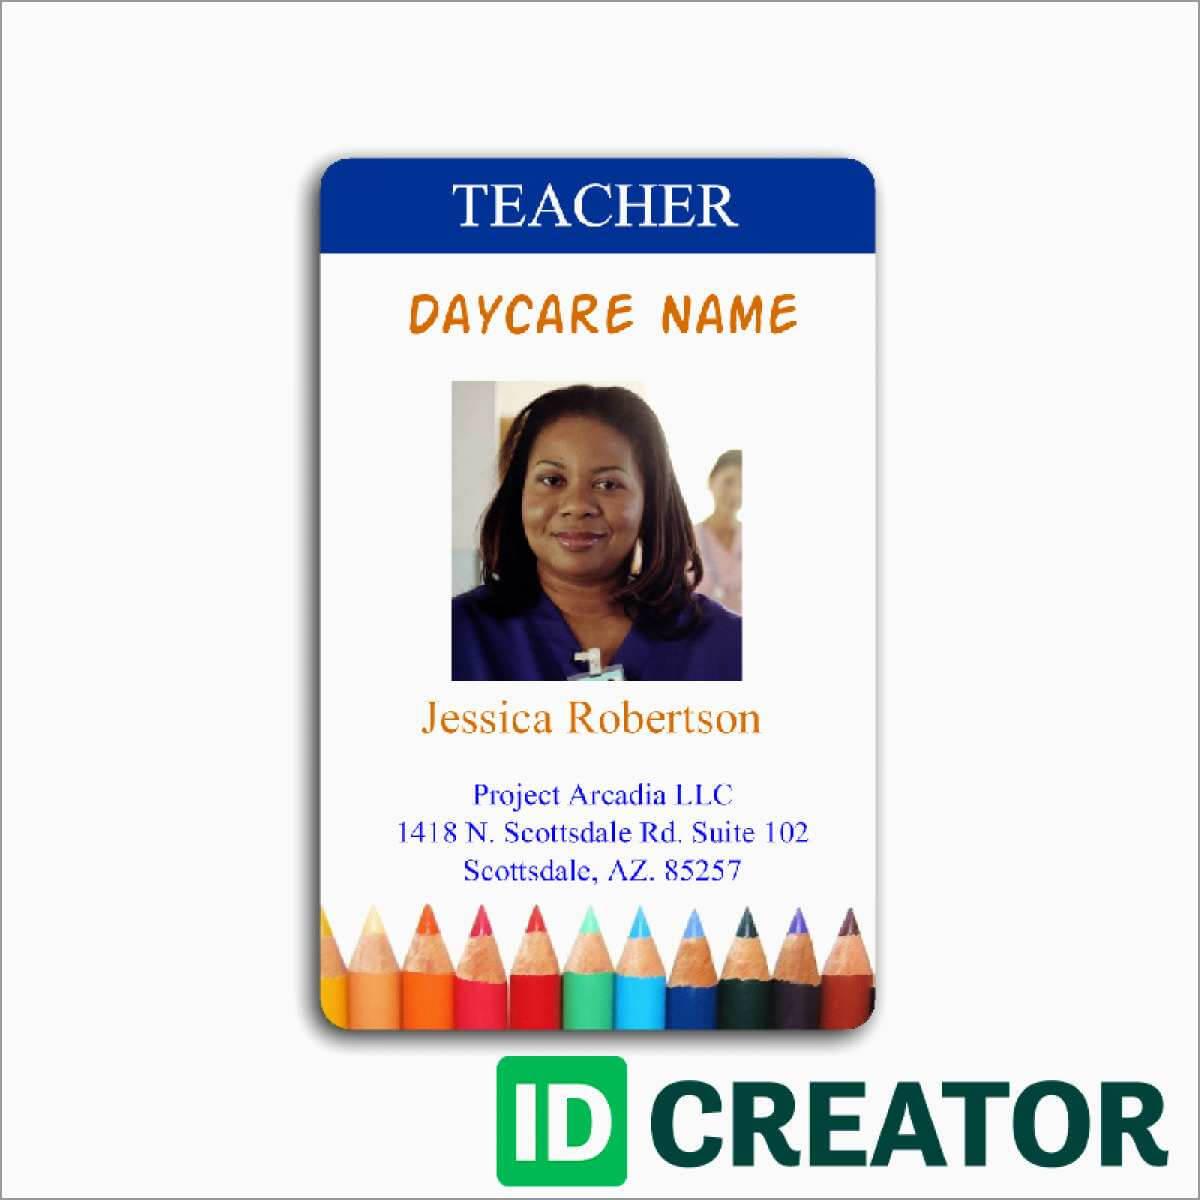 023 Teacher Id Card Photoshop Template Ideas Free Great With Regard To Teacher Id Card Template